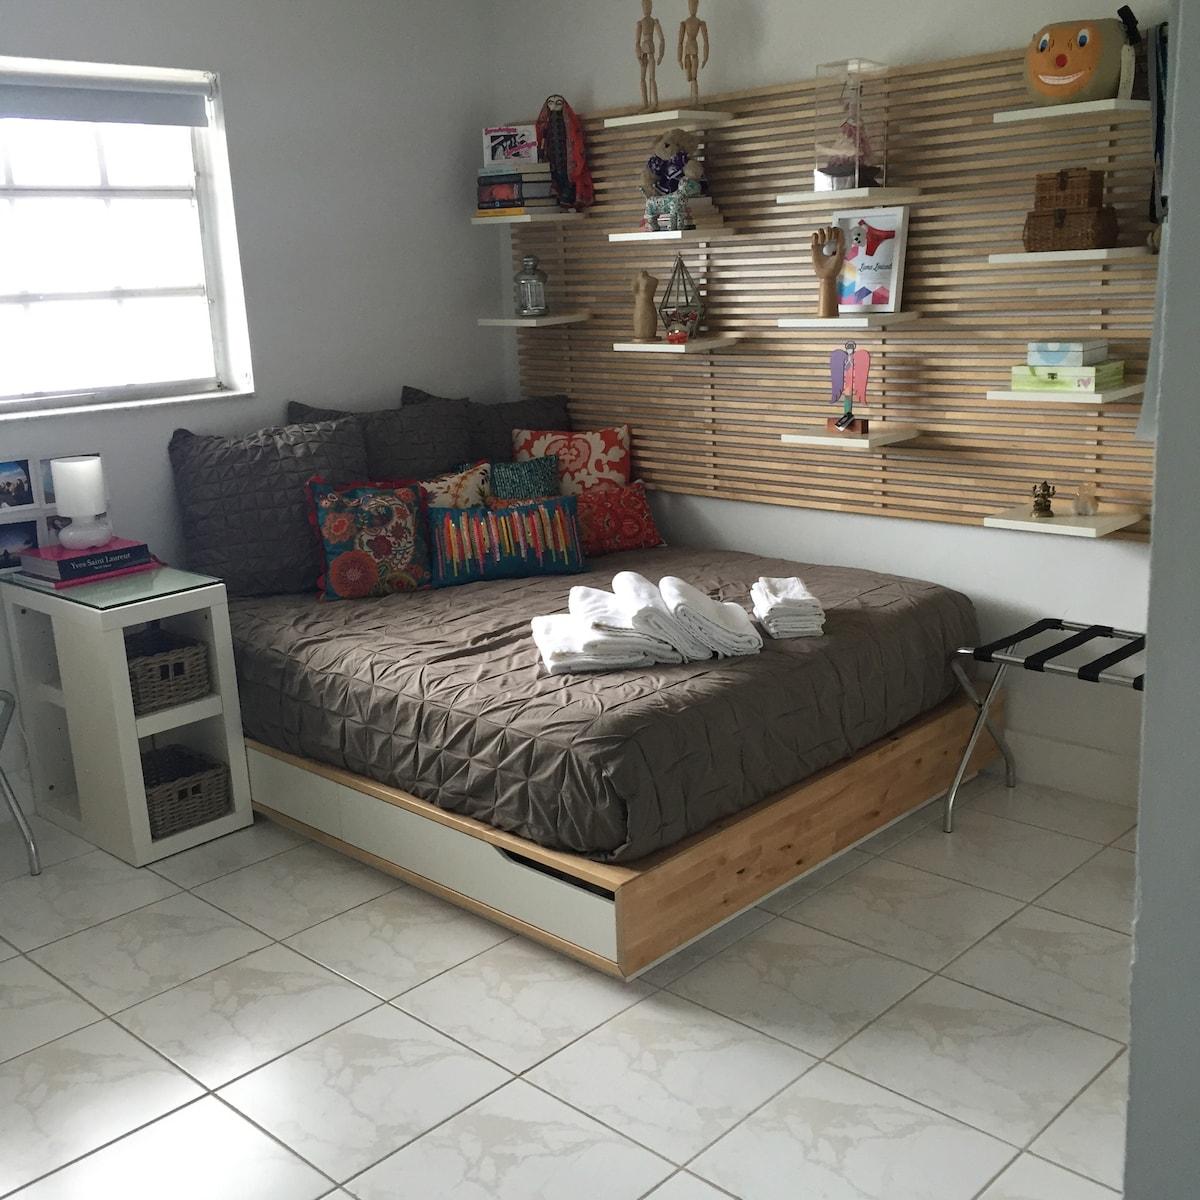 Lovely room in Key Biscayne